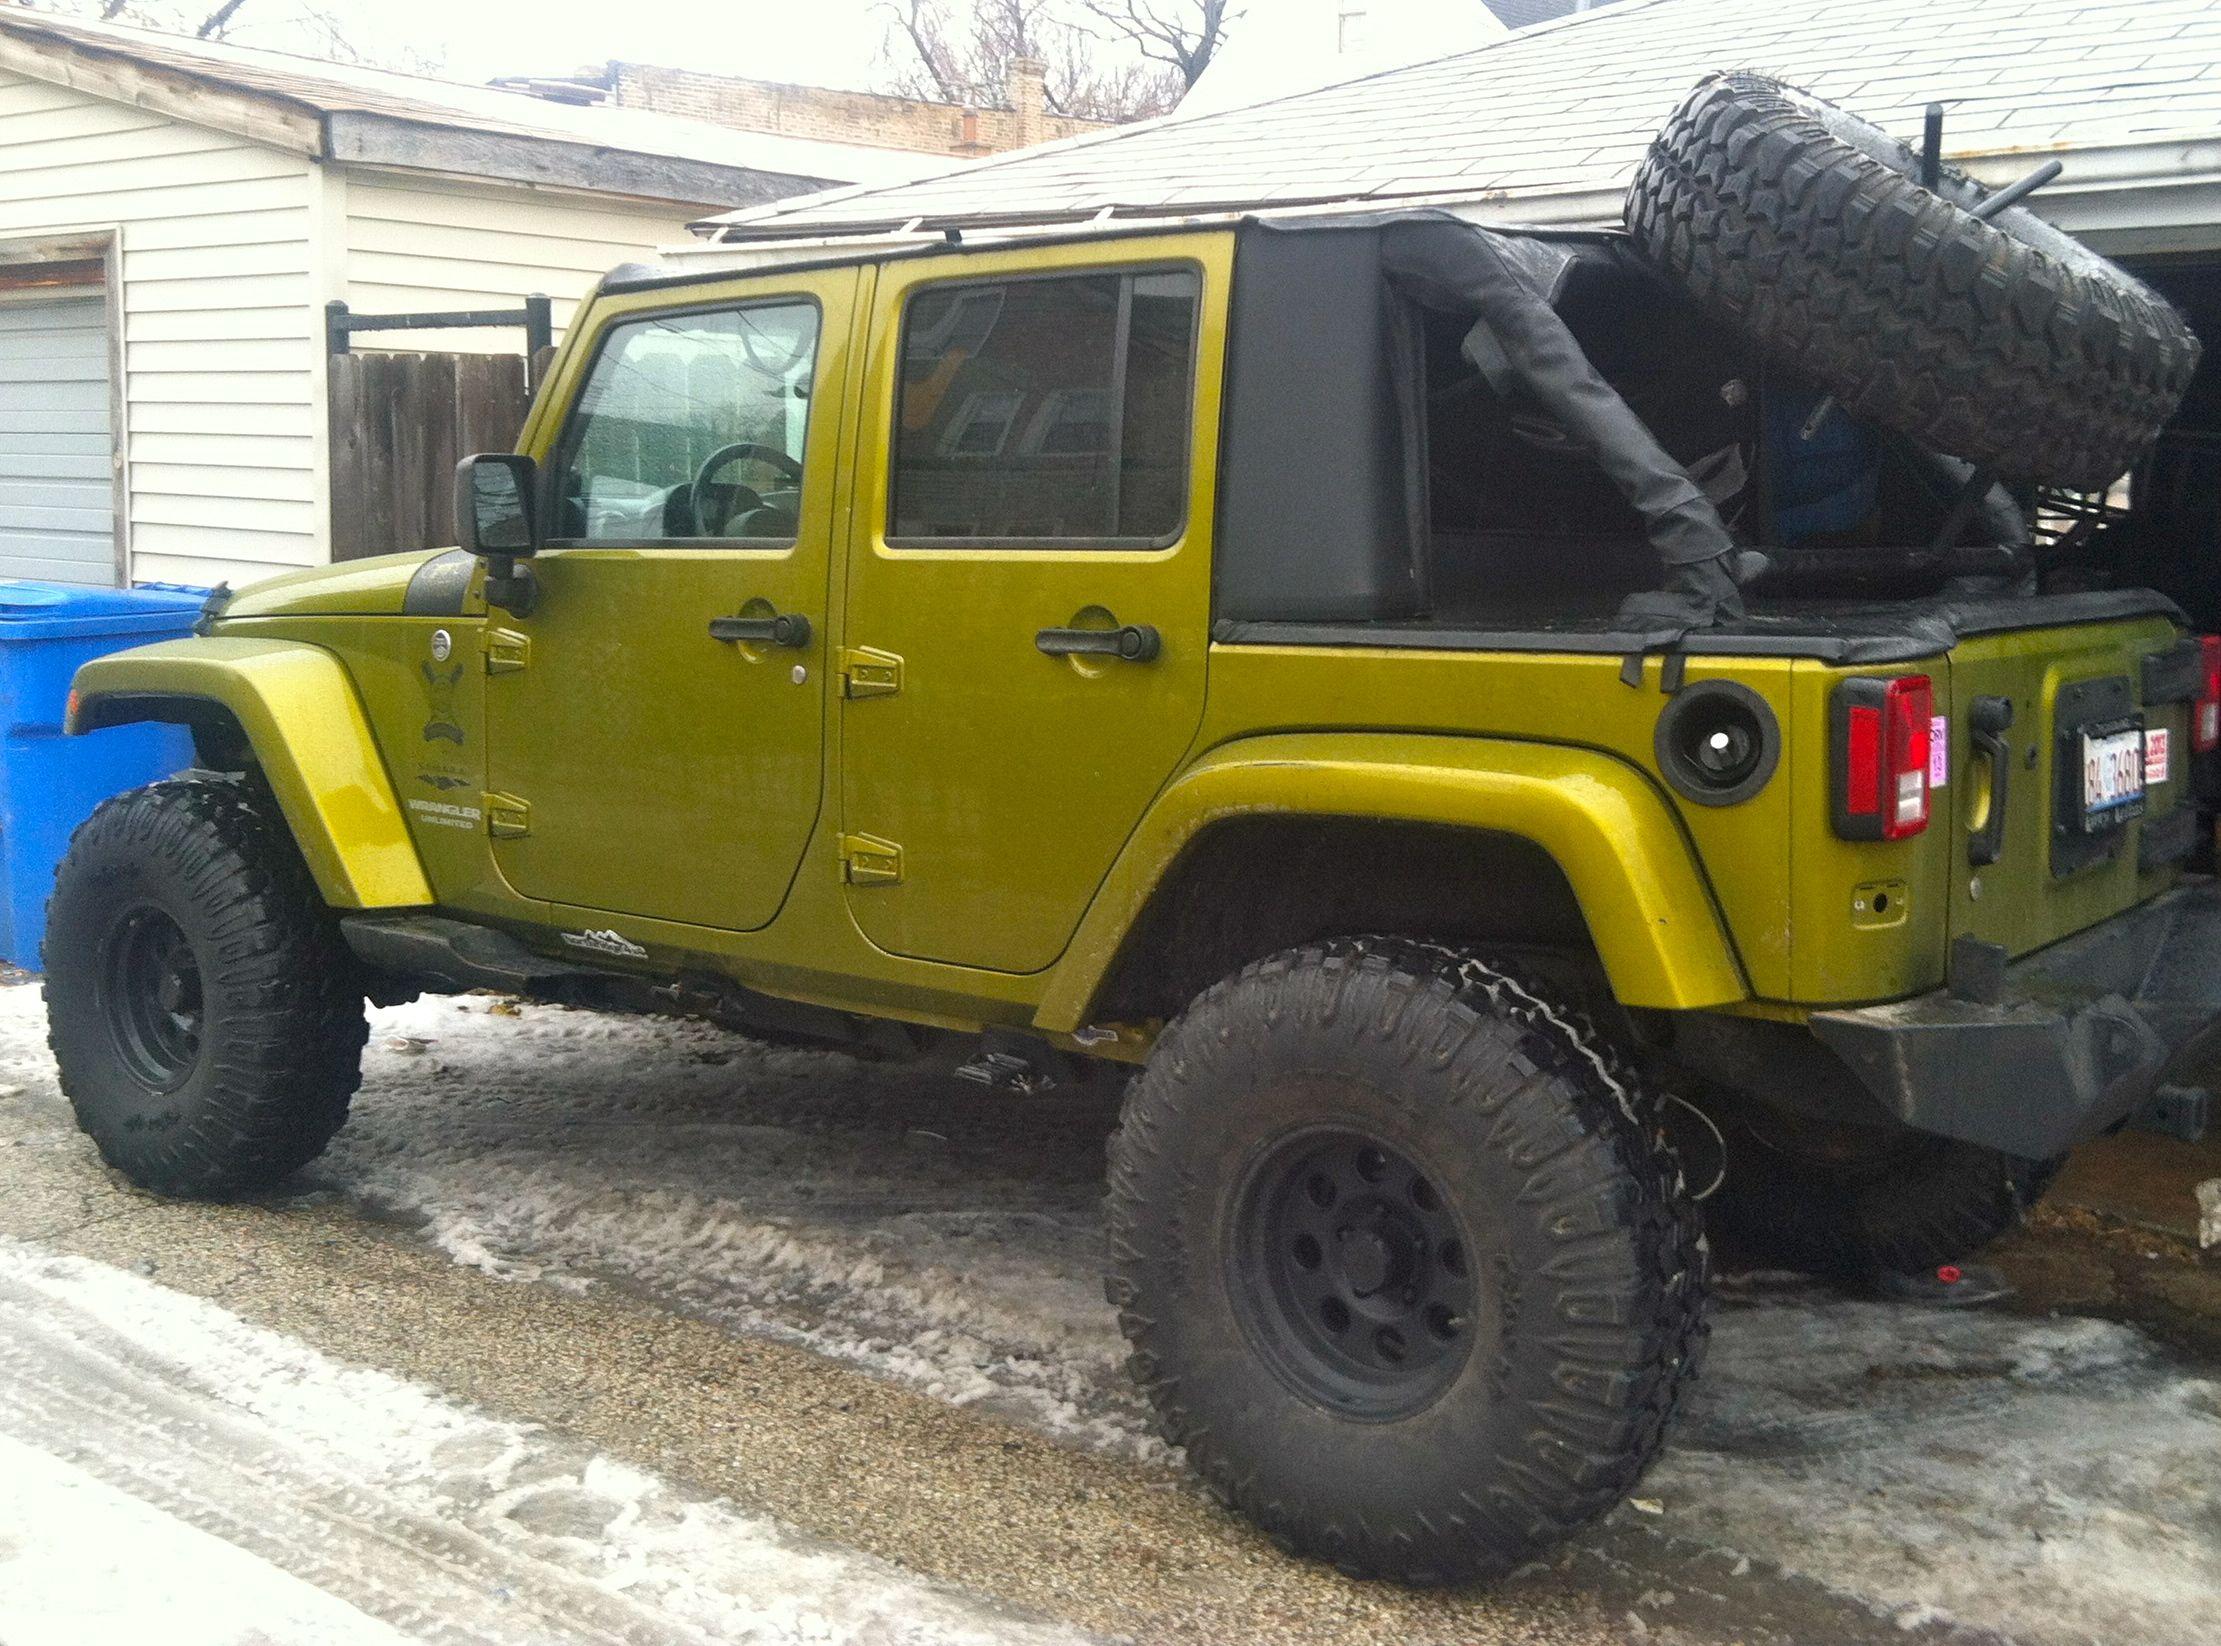 Jeep Wrangler Jk Custom Tire Carrier Jeep Wrangler Jeep Cars